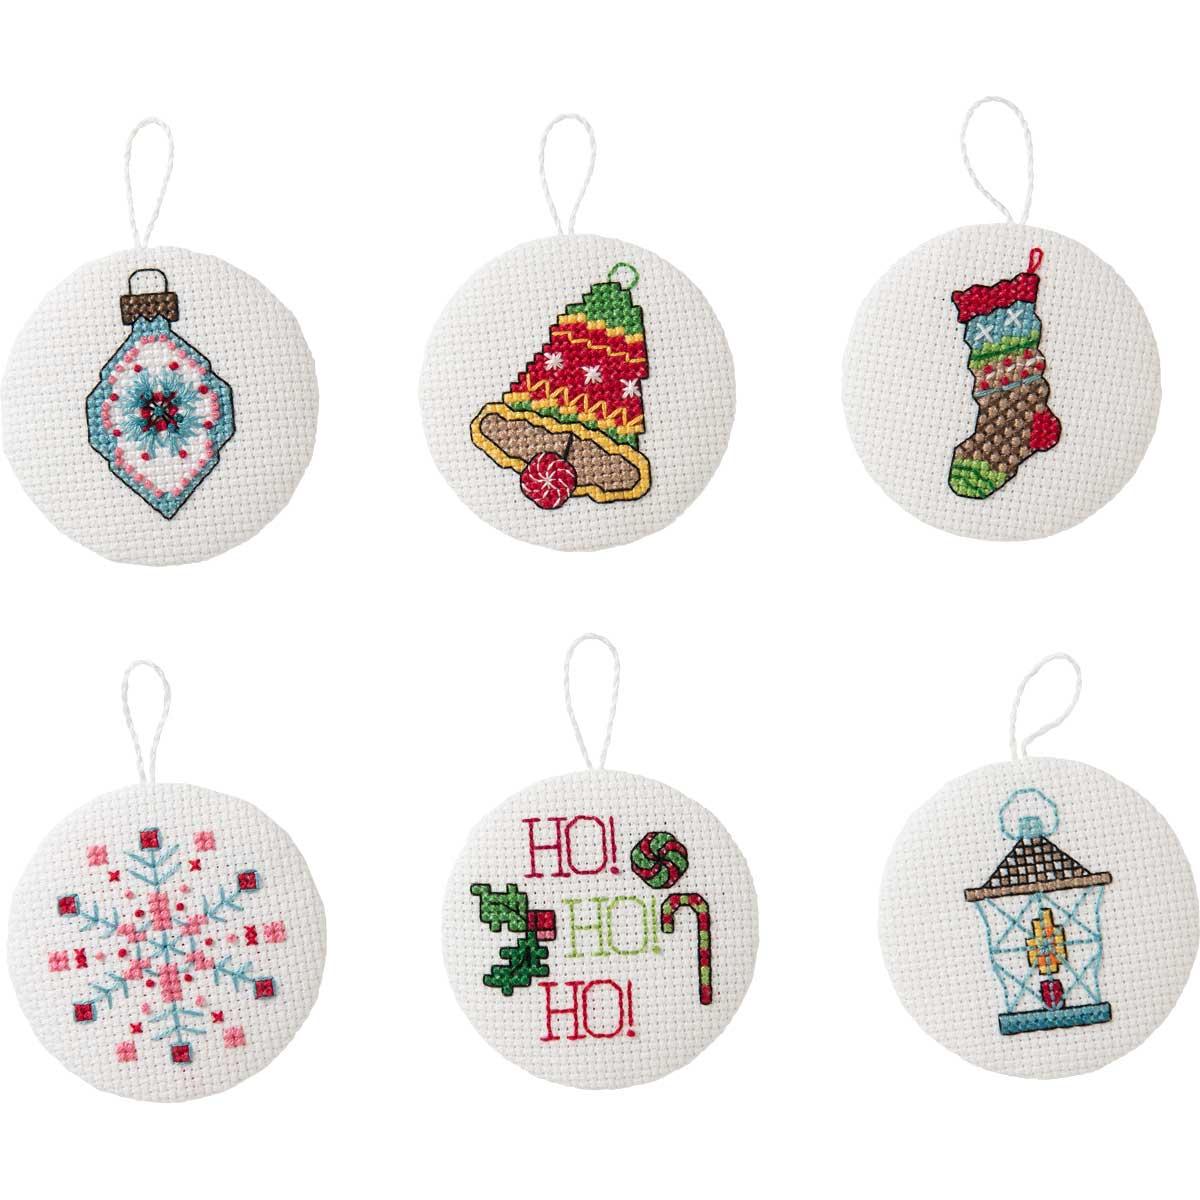 Bucilla Seasonal - Counted Cross Stitch - Tree Trimmer Kits - Hallmark - Magical Moments